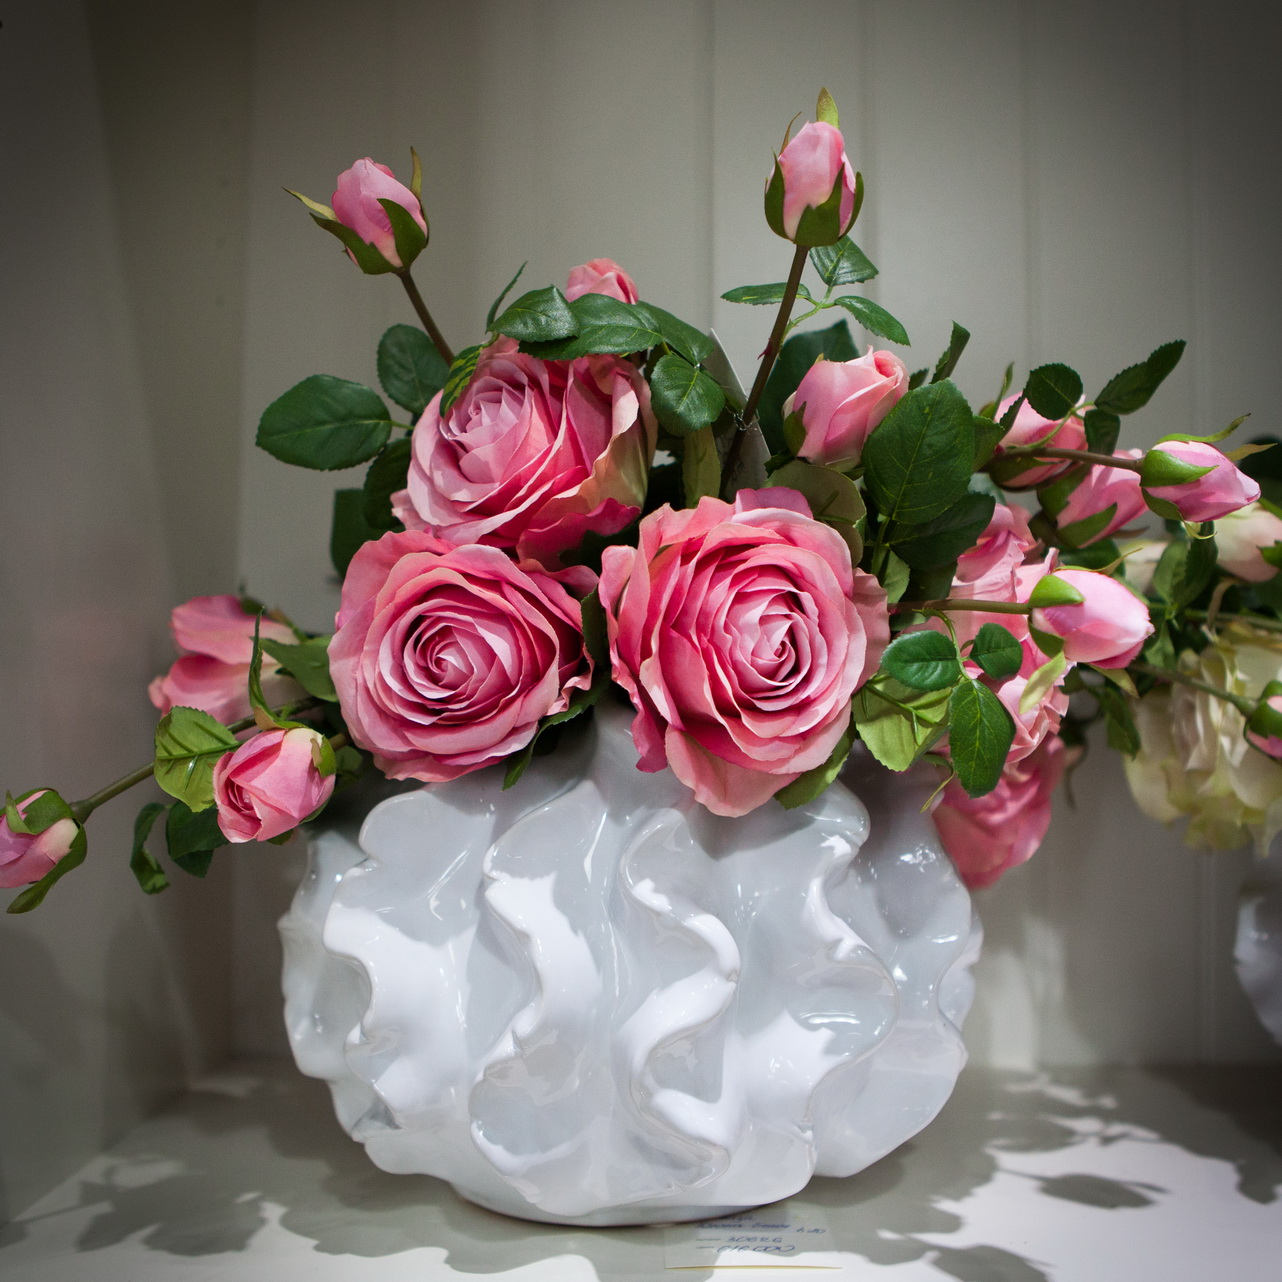 Цветы в вазе фото дома